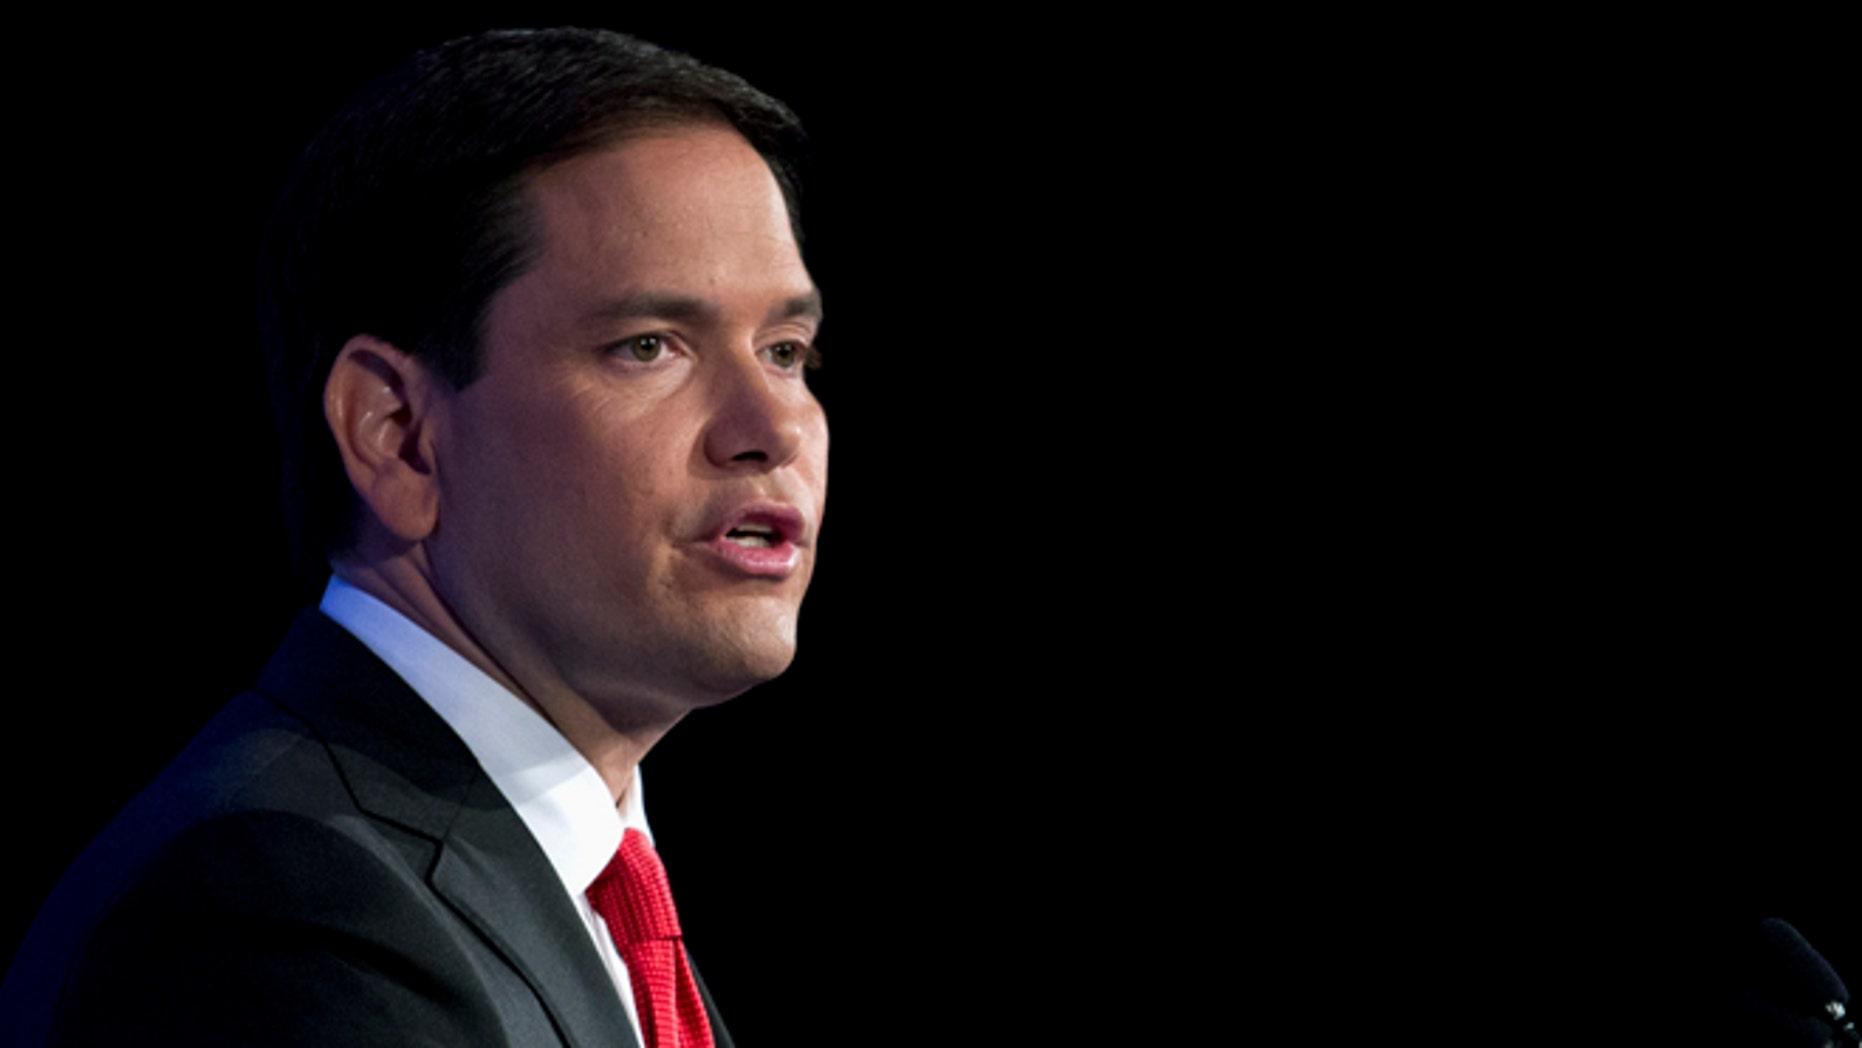 Sen. Marco Rubio during the Values Voter Summit on Friday, Sept. 25, 2015, in Washington.